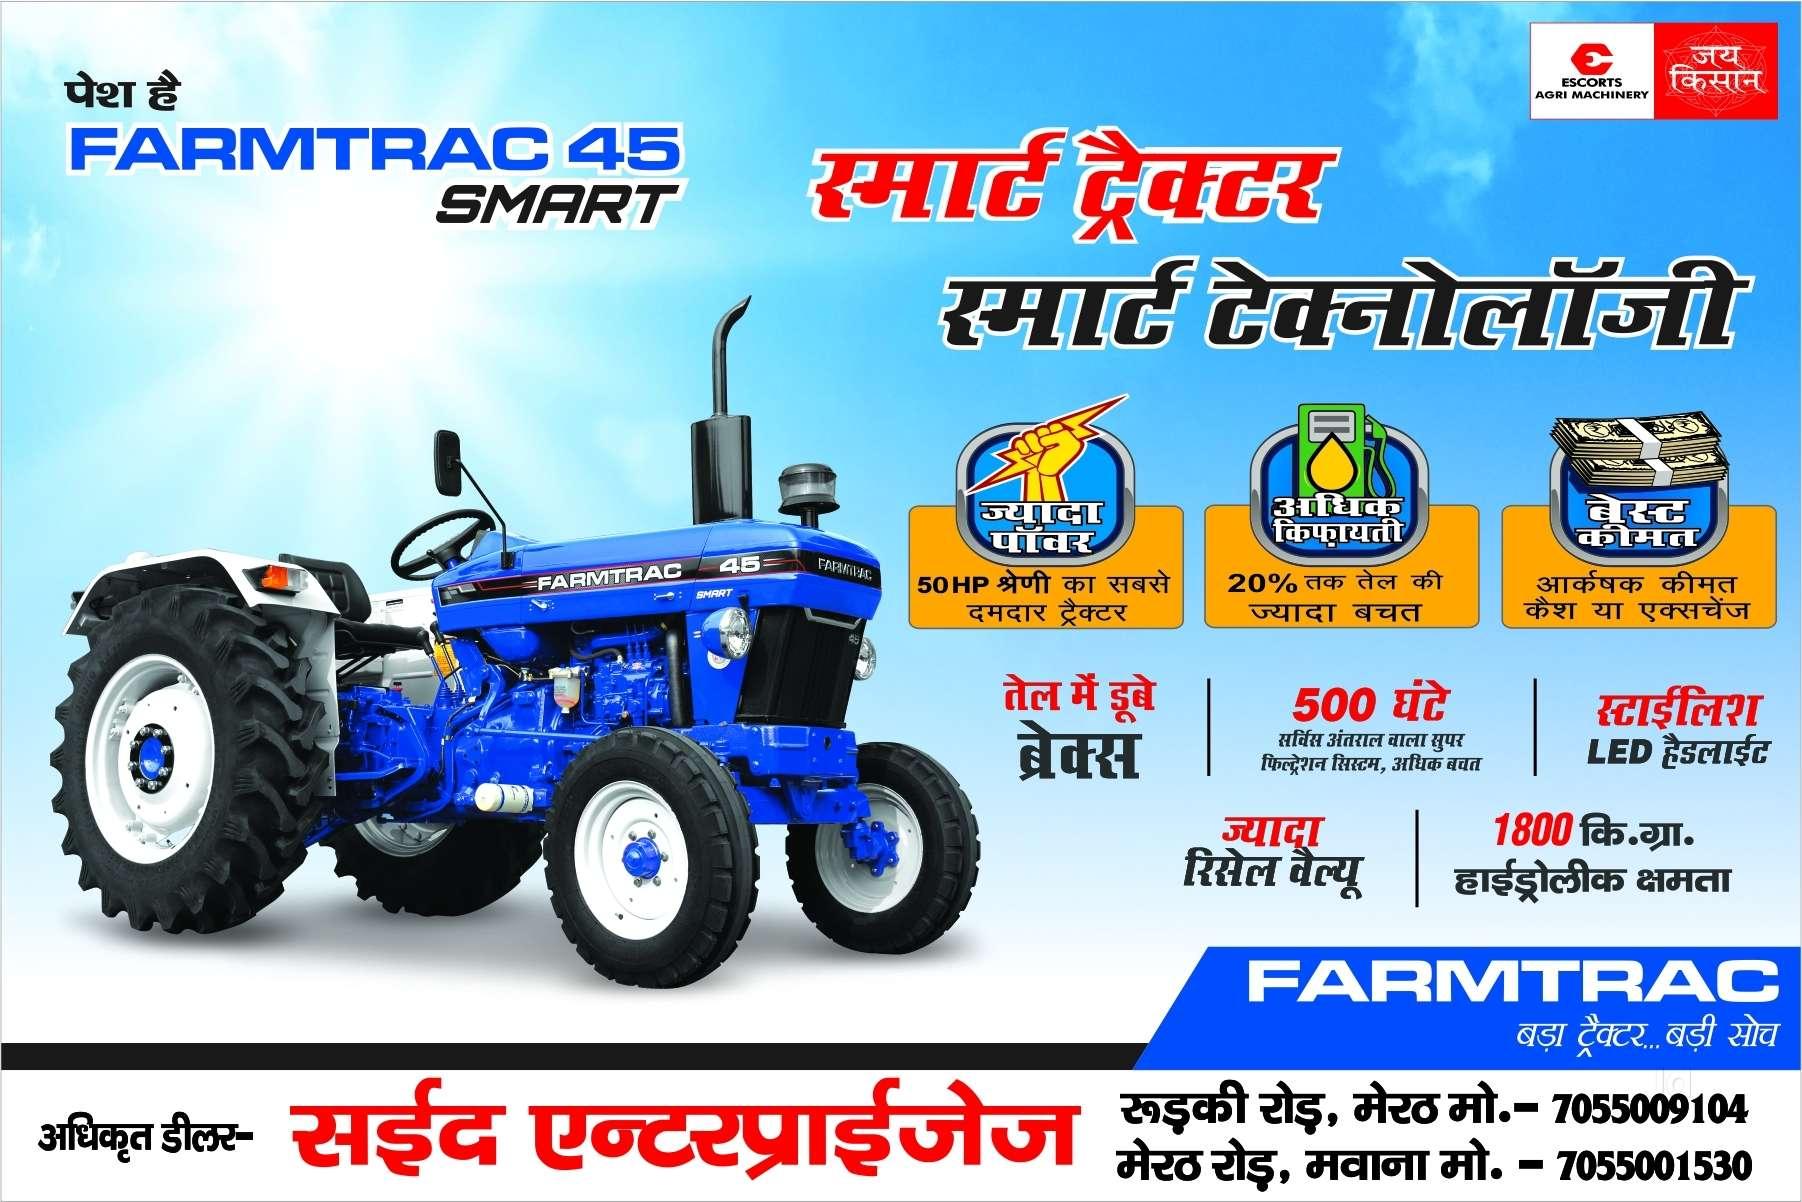 Top Farmtrac Tractor Dealers in Meerut - Best Farmtrac Tractor